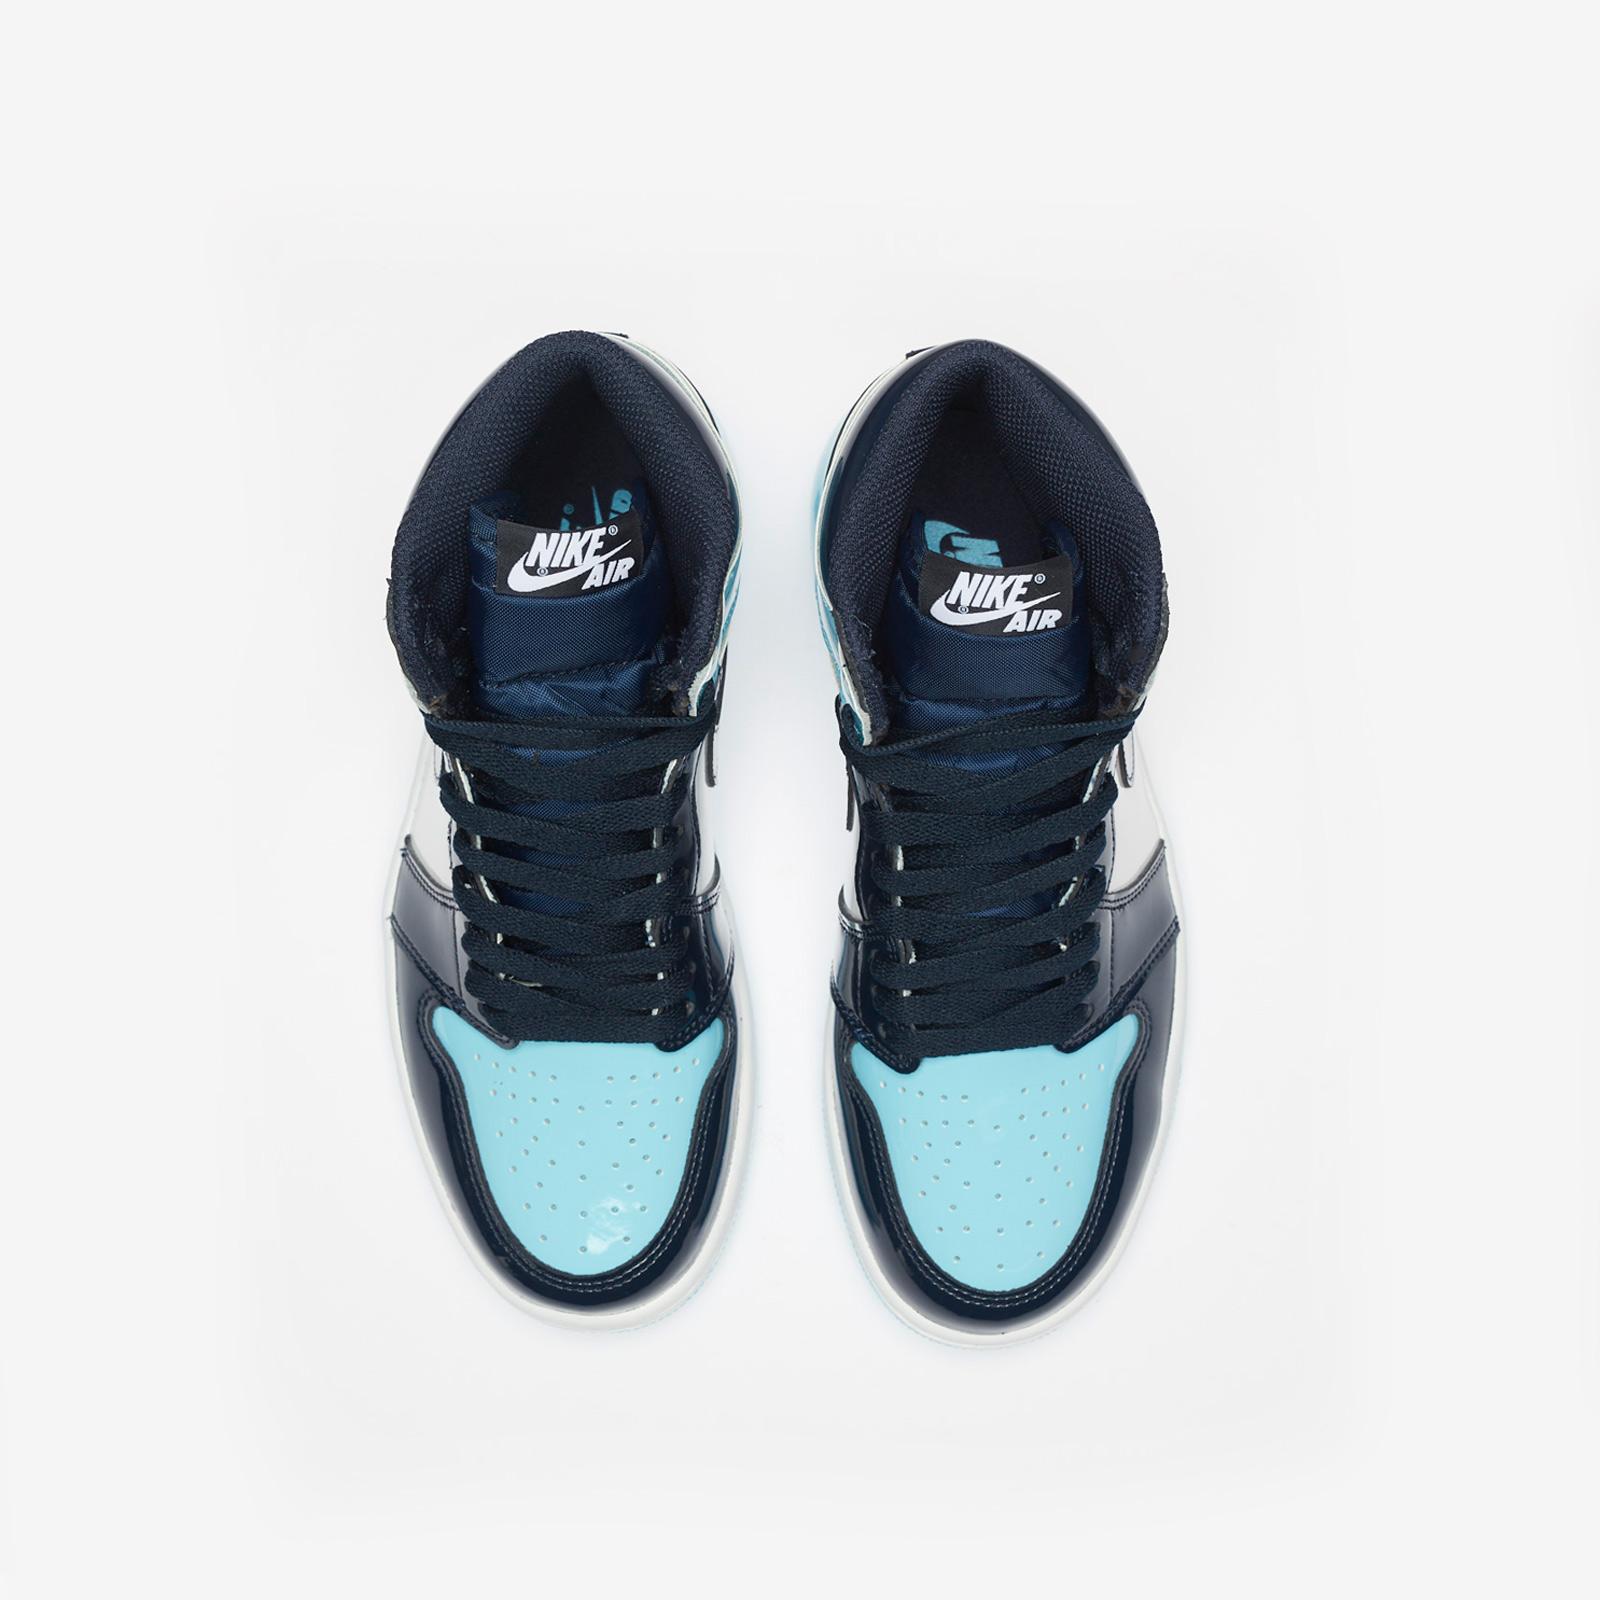 578cf2ac2c4abe Jordan Brand Wmns Air Jordan 1 High OG - Cd0461-401 - Sneakersnstuff ...